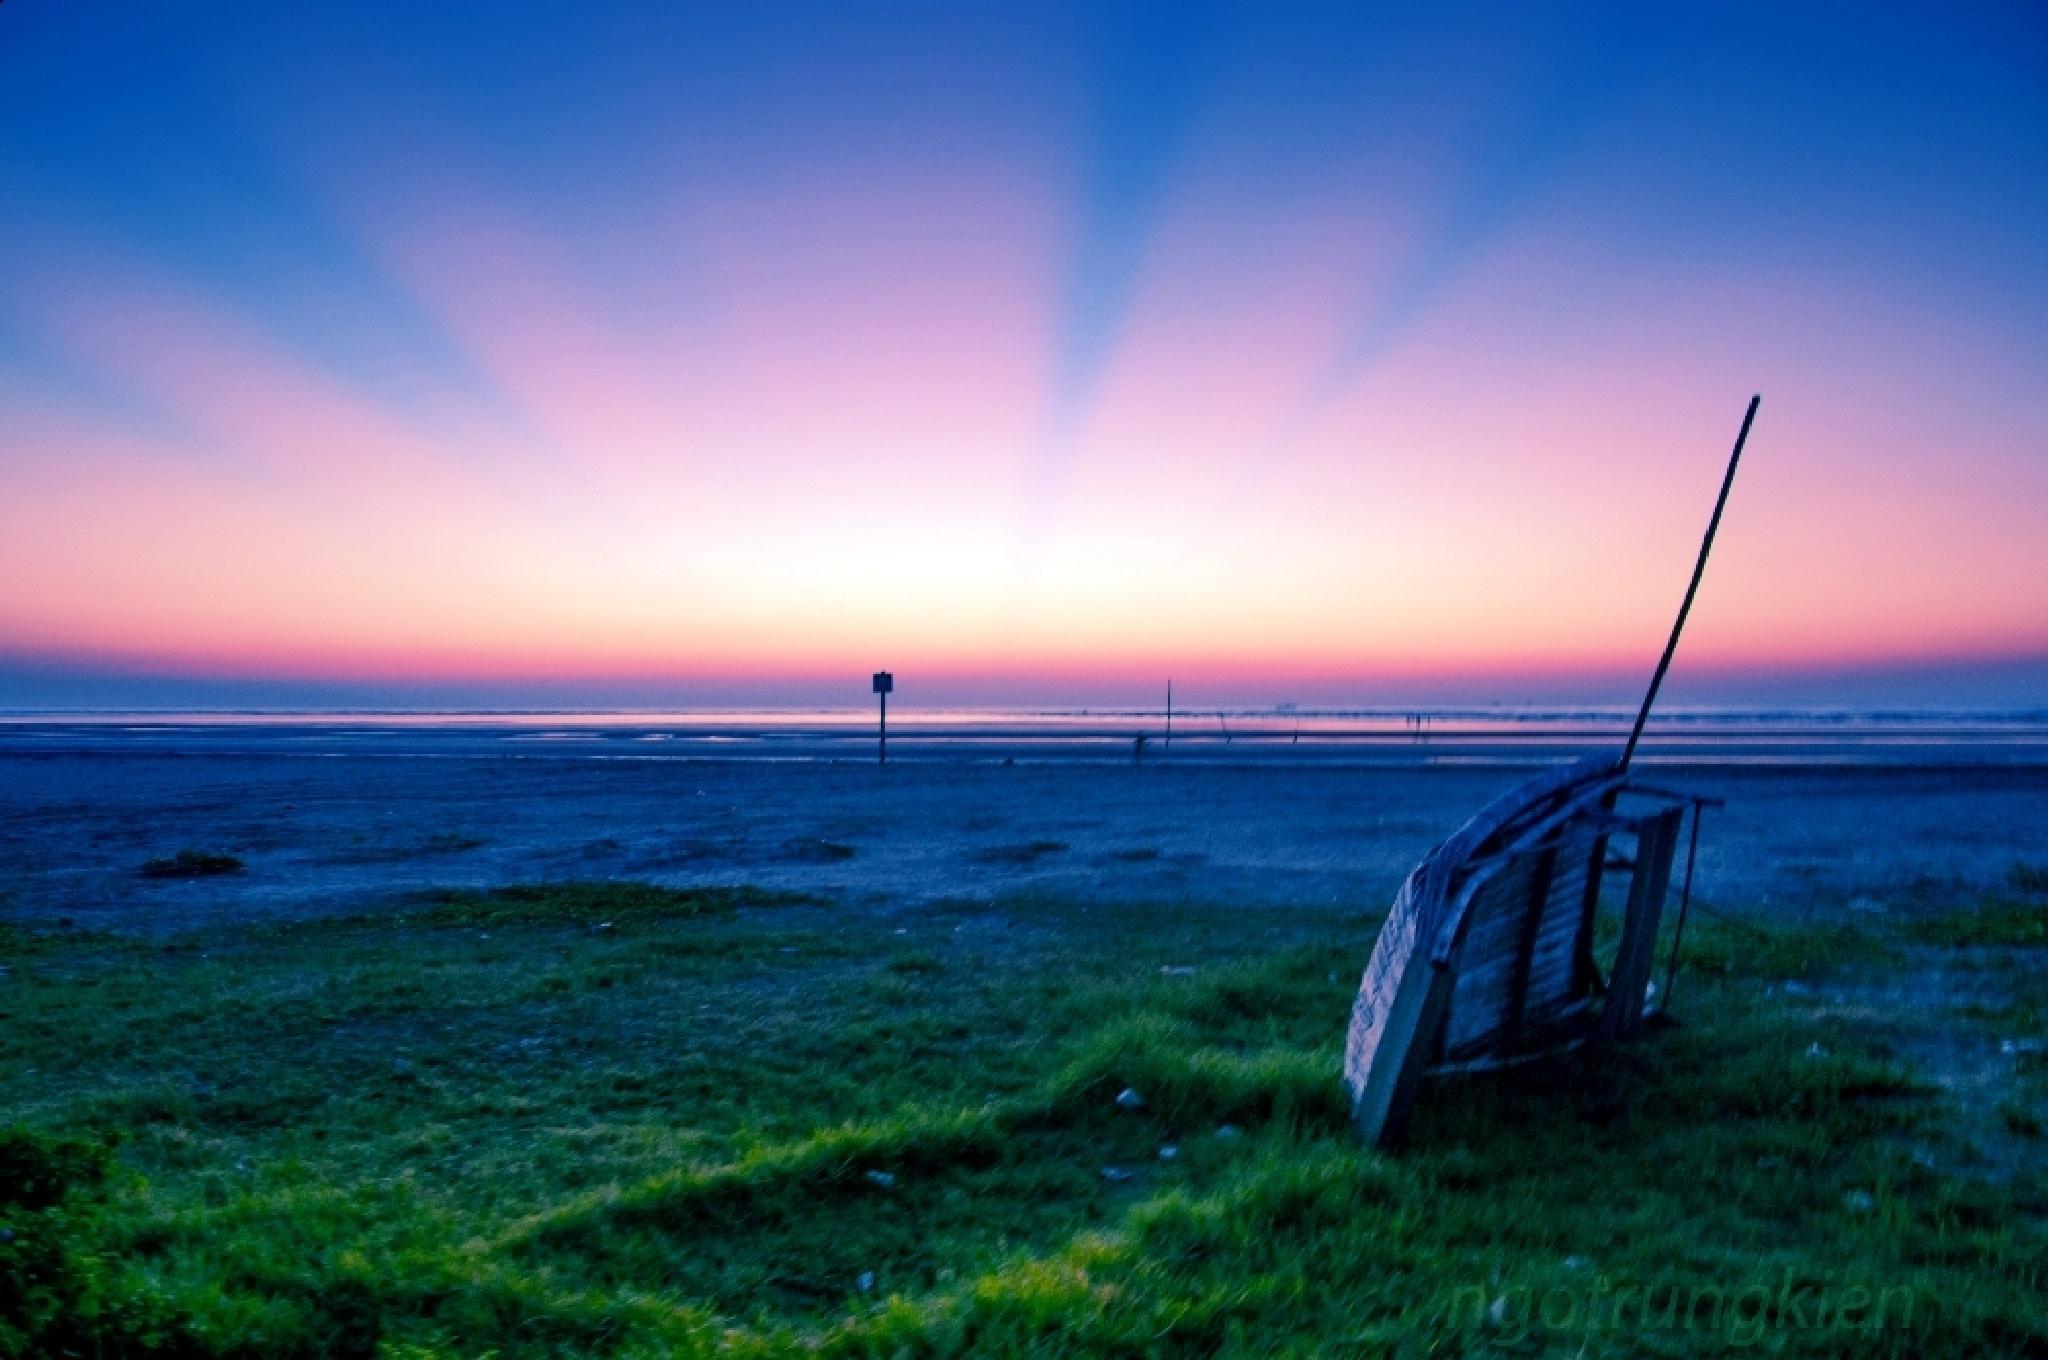 forgoten boat on the beach by kienngotrung18